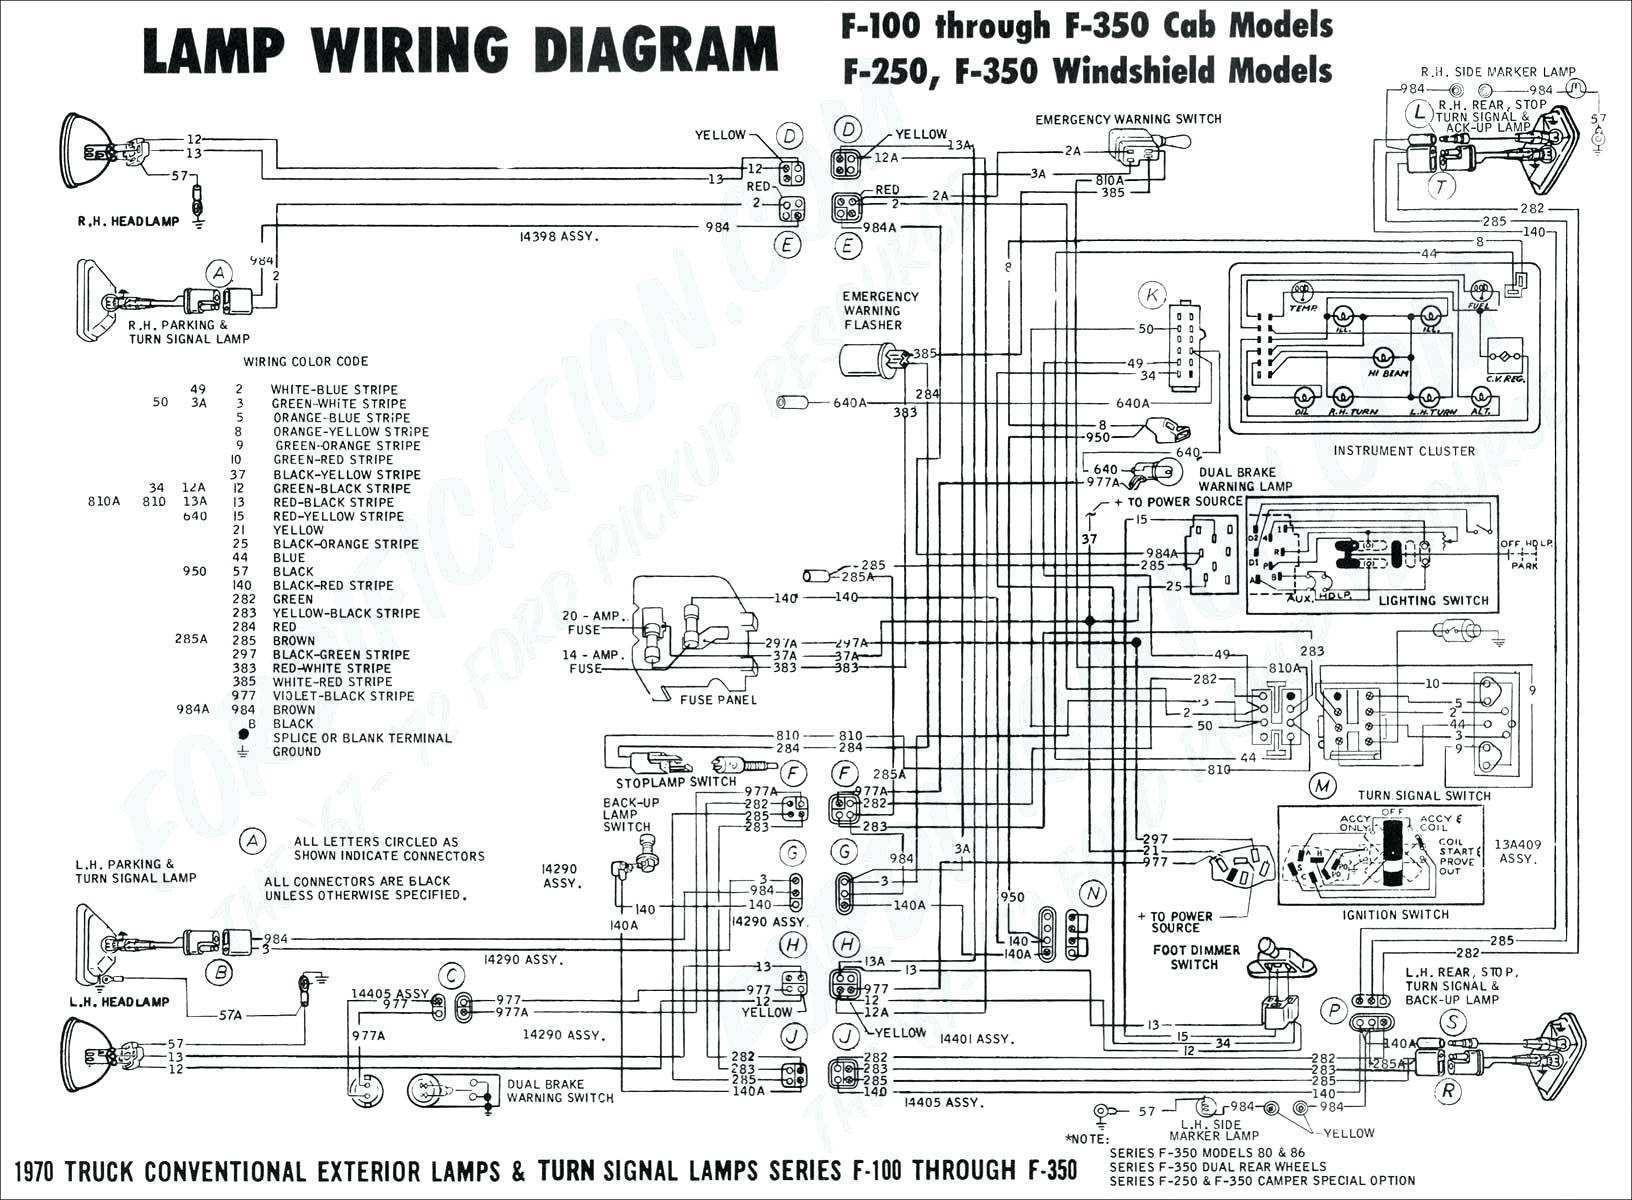 Third Brake Light Wiring Diagram New Third Brake Light Wiring Diagram Diagram – Wiring Diagram Collection Of Third Brake Light Wiring Diagram